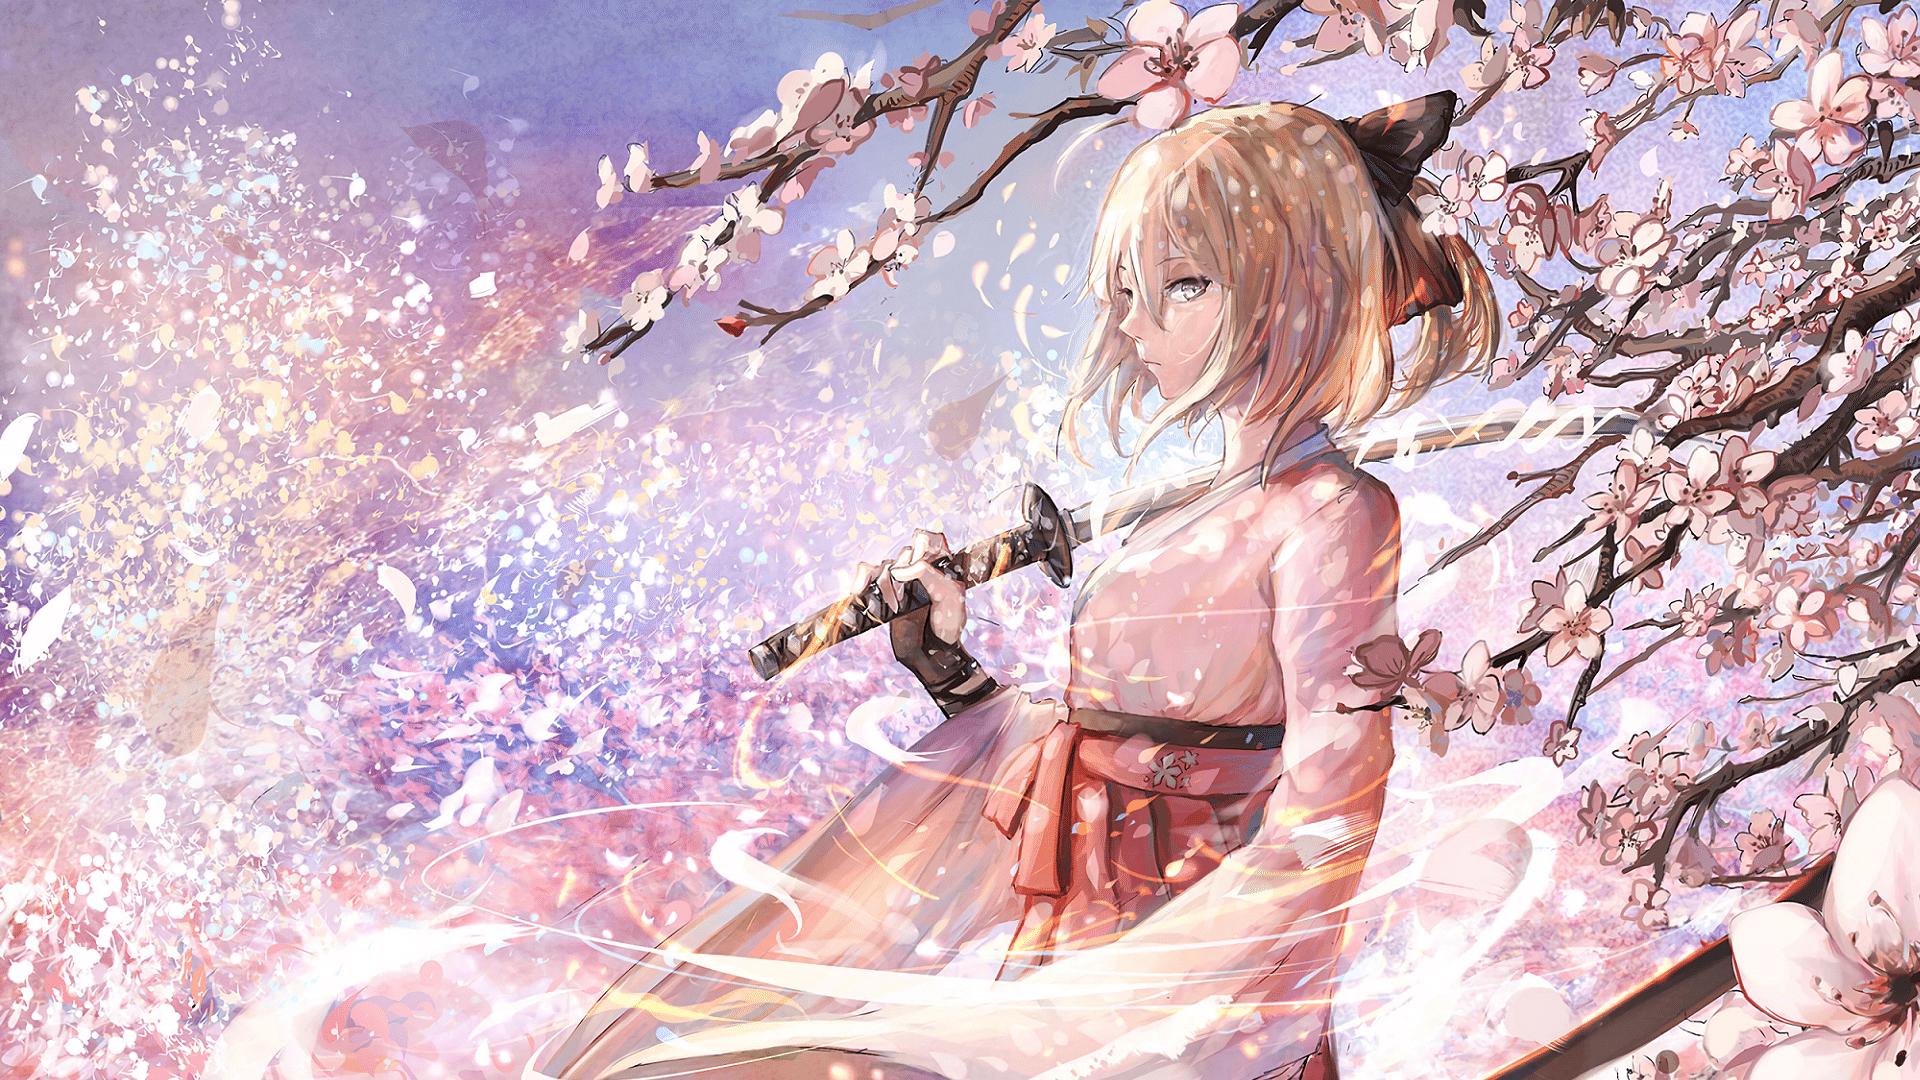 Sakura Saber 1920x1080 Hd Wallpaper From Gallsource Com